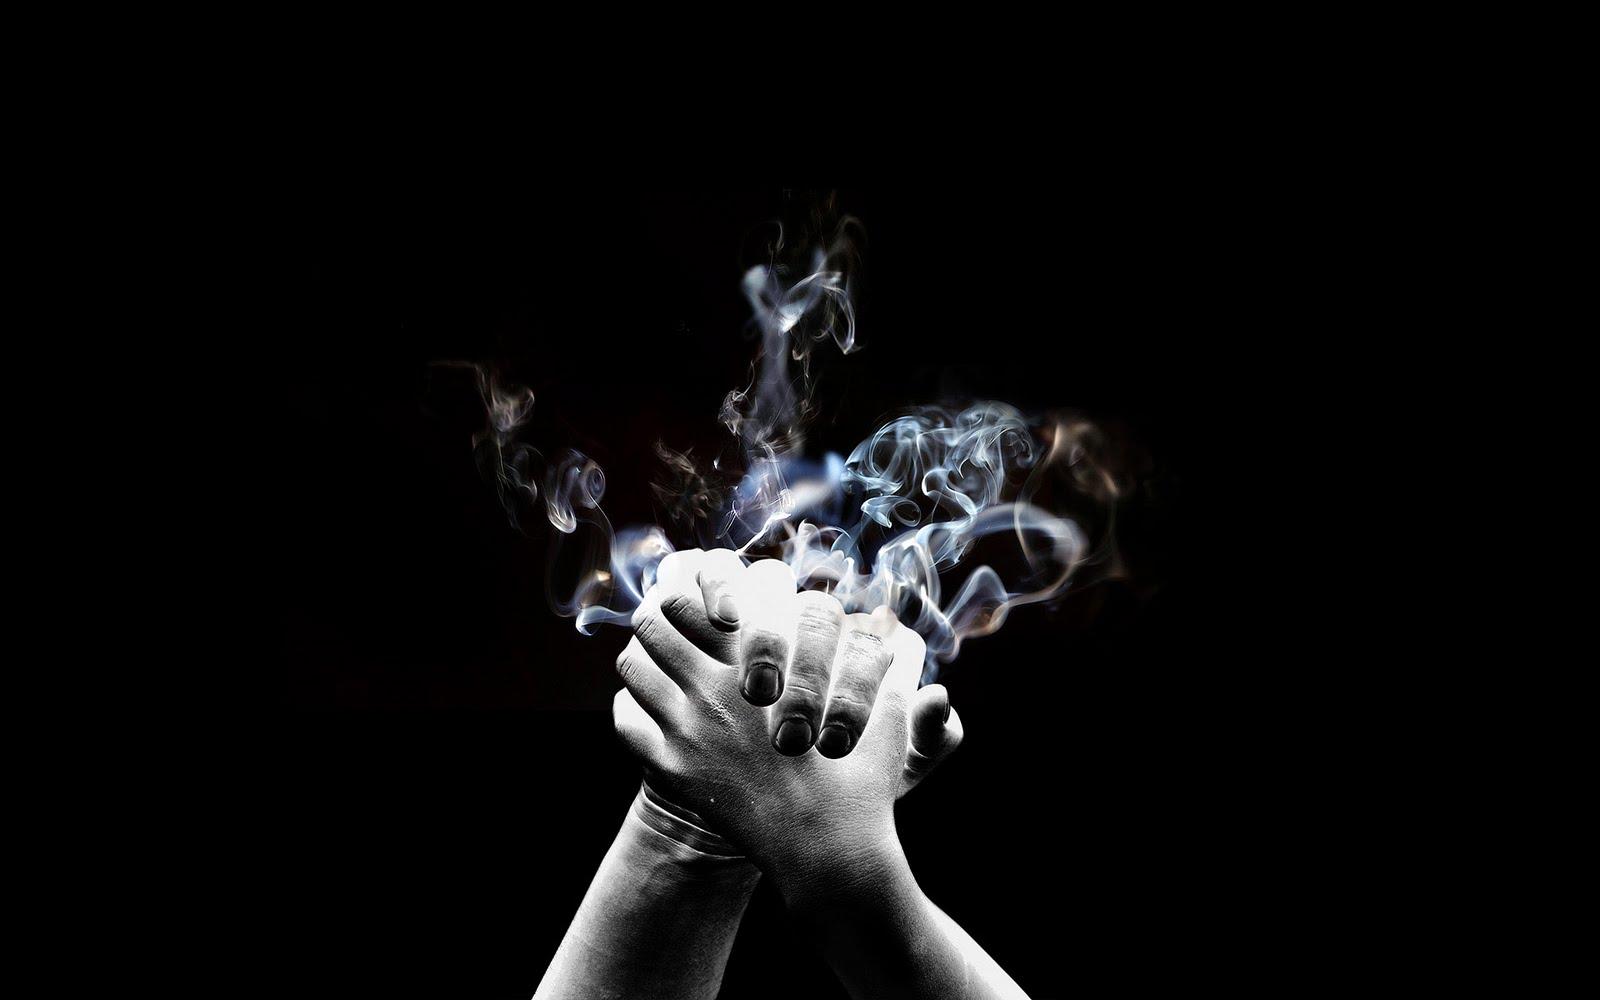 http://2.bp.blogspot.com/-Whsg08Uzus4/TkTMrgRm5lI/AAAAAAAAASQ/i4YPNZRJ4tI/s1600/Smoke-hand.jpg